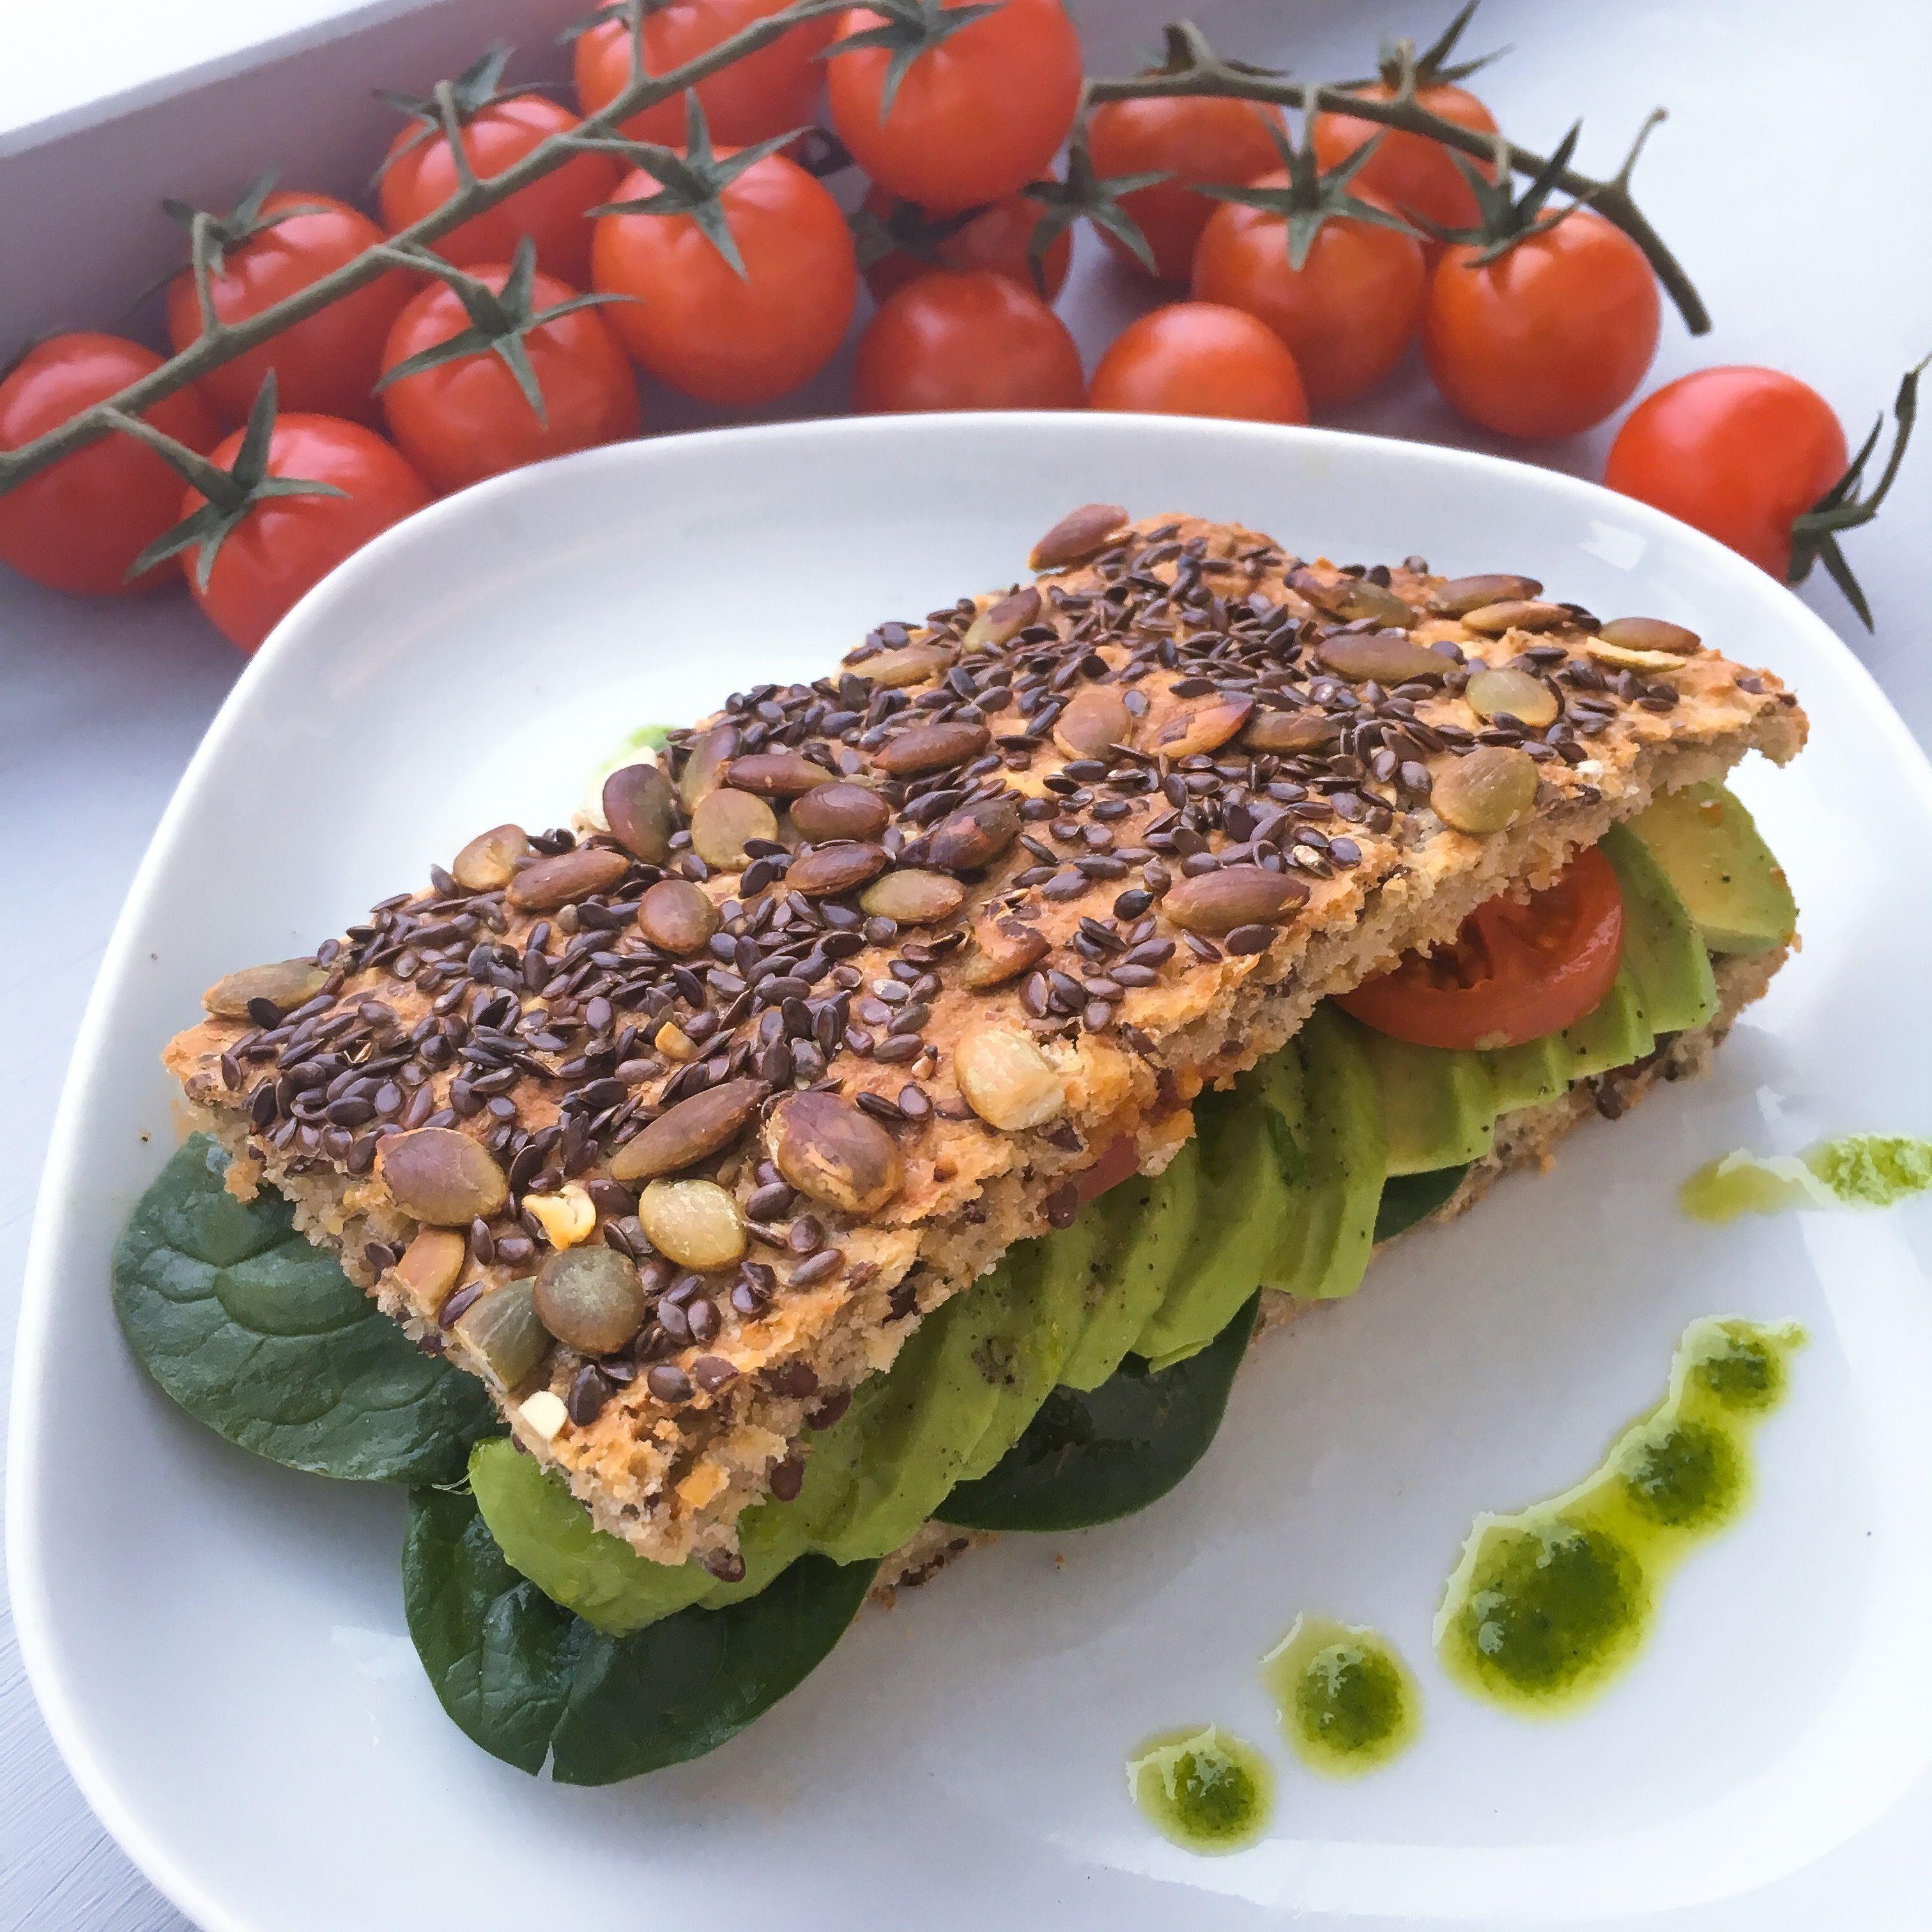 Pin by VEEG on Gluten Free Vegan Bread & Baked Goods